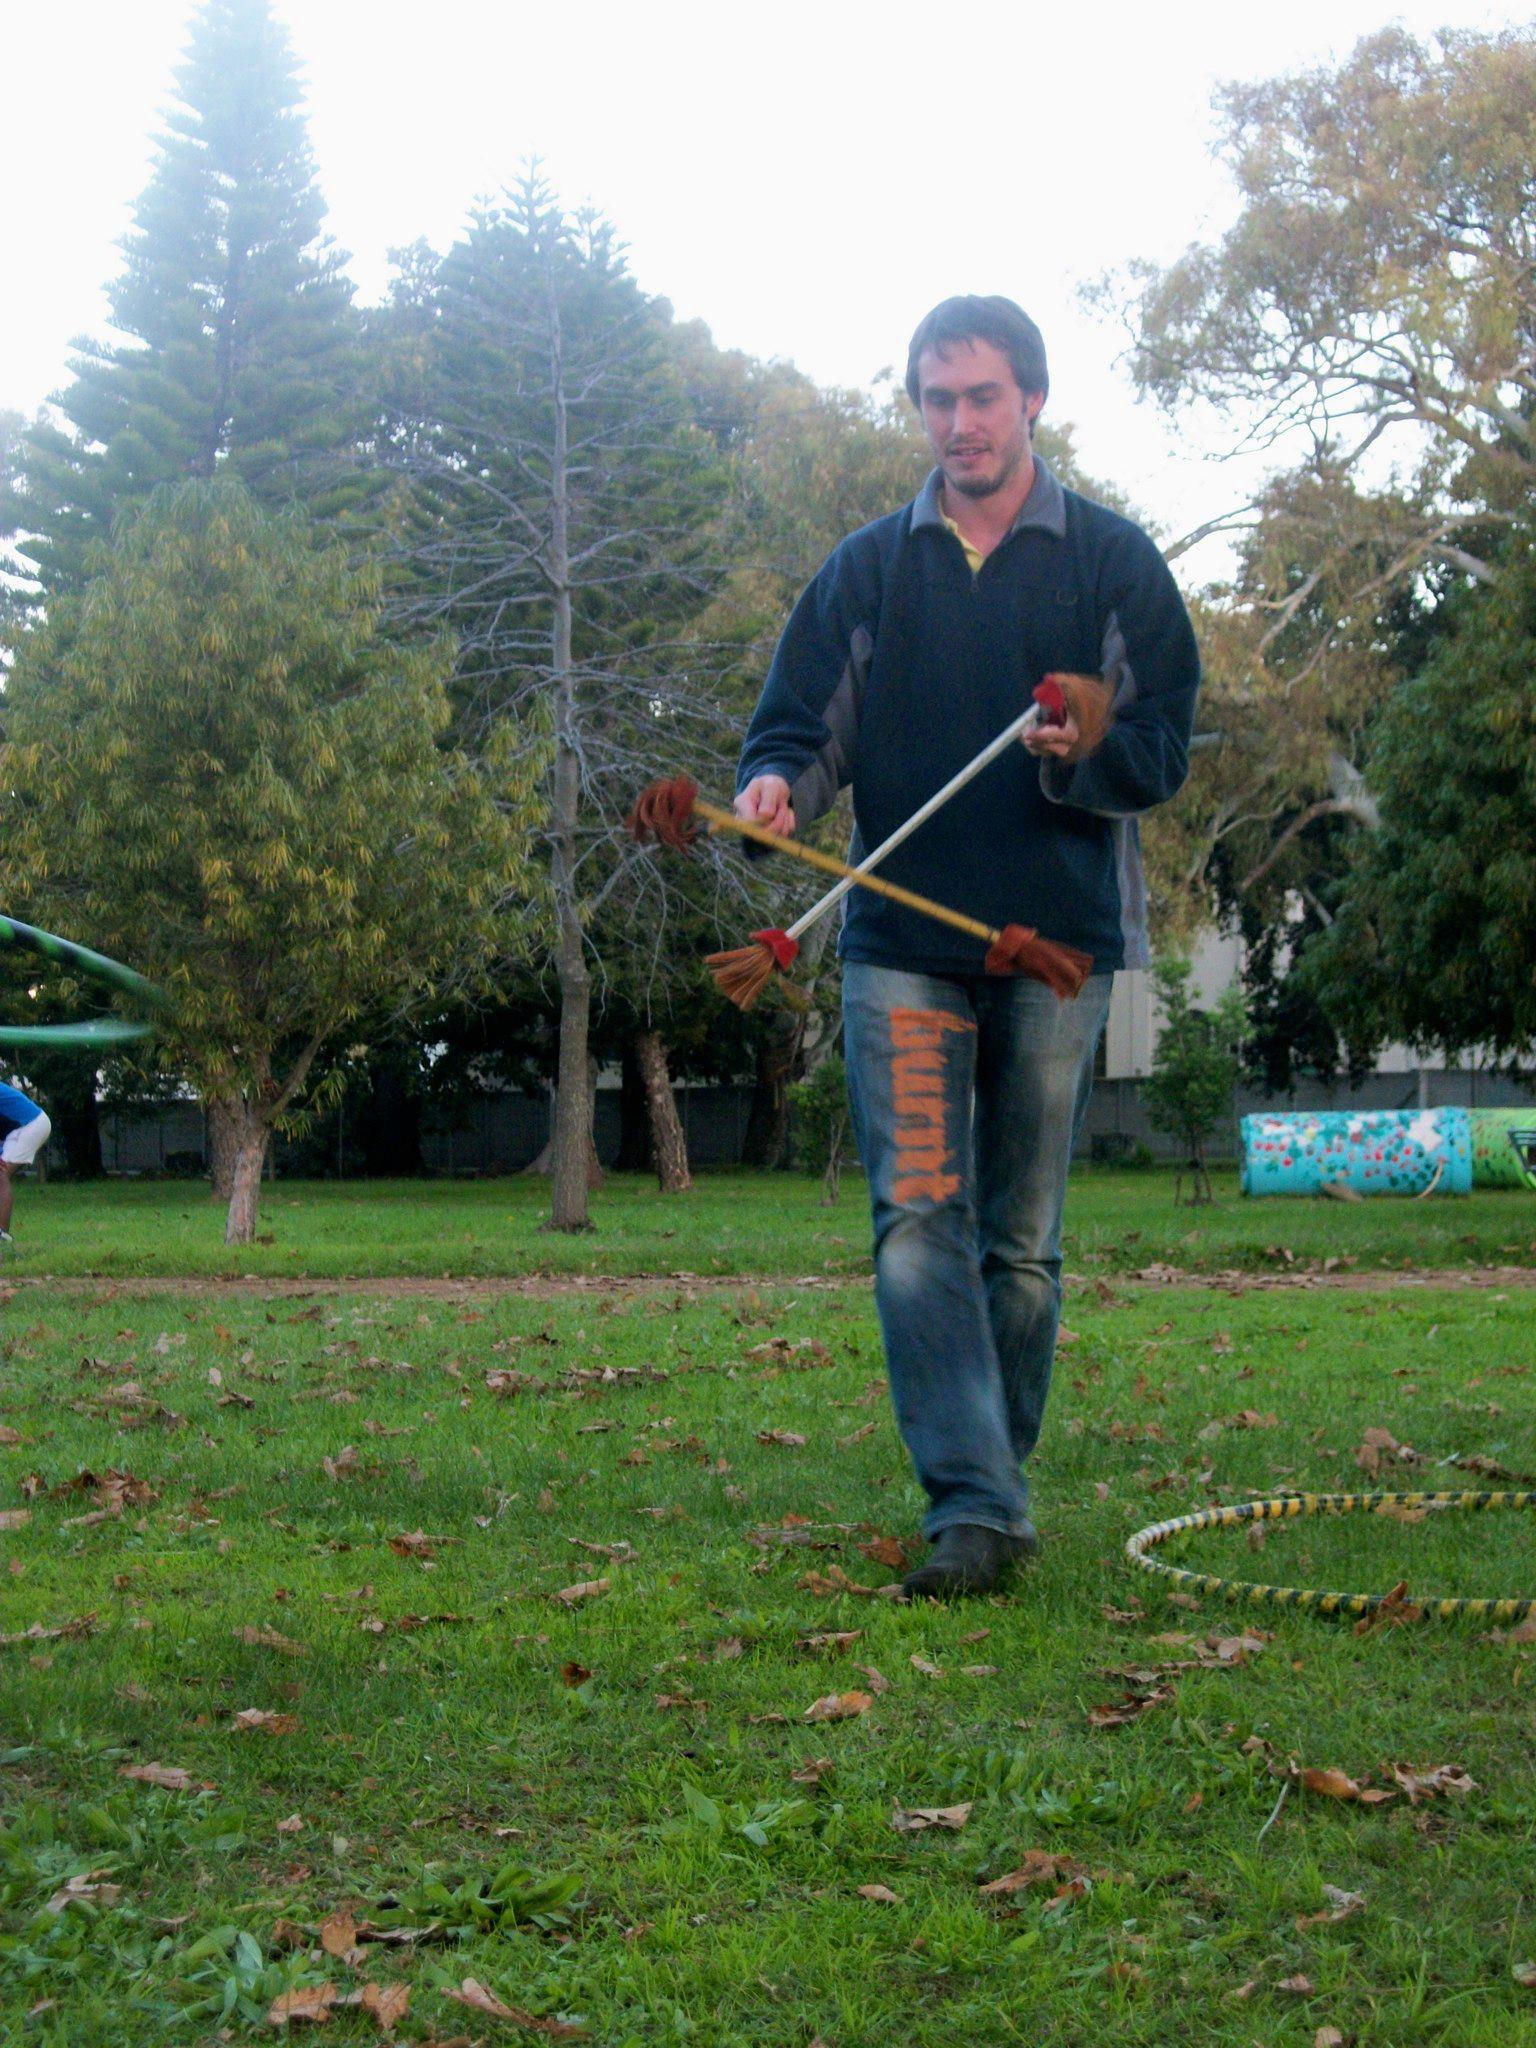 Duncan Greenwood spinning flower sticks in 2012